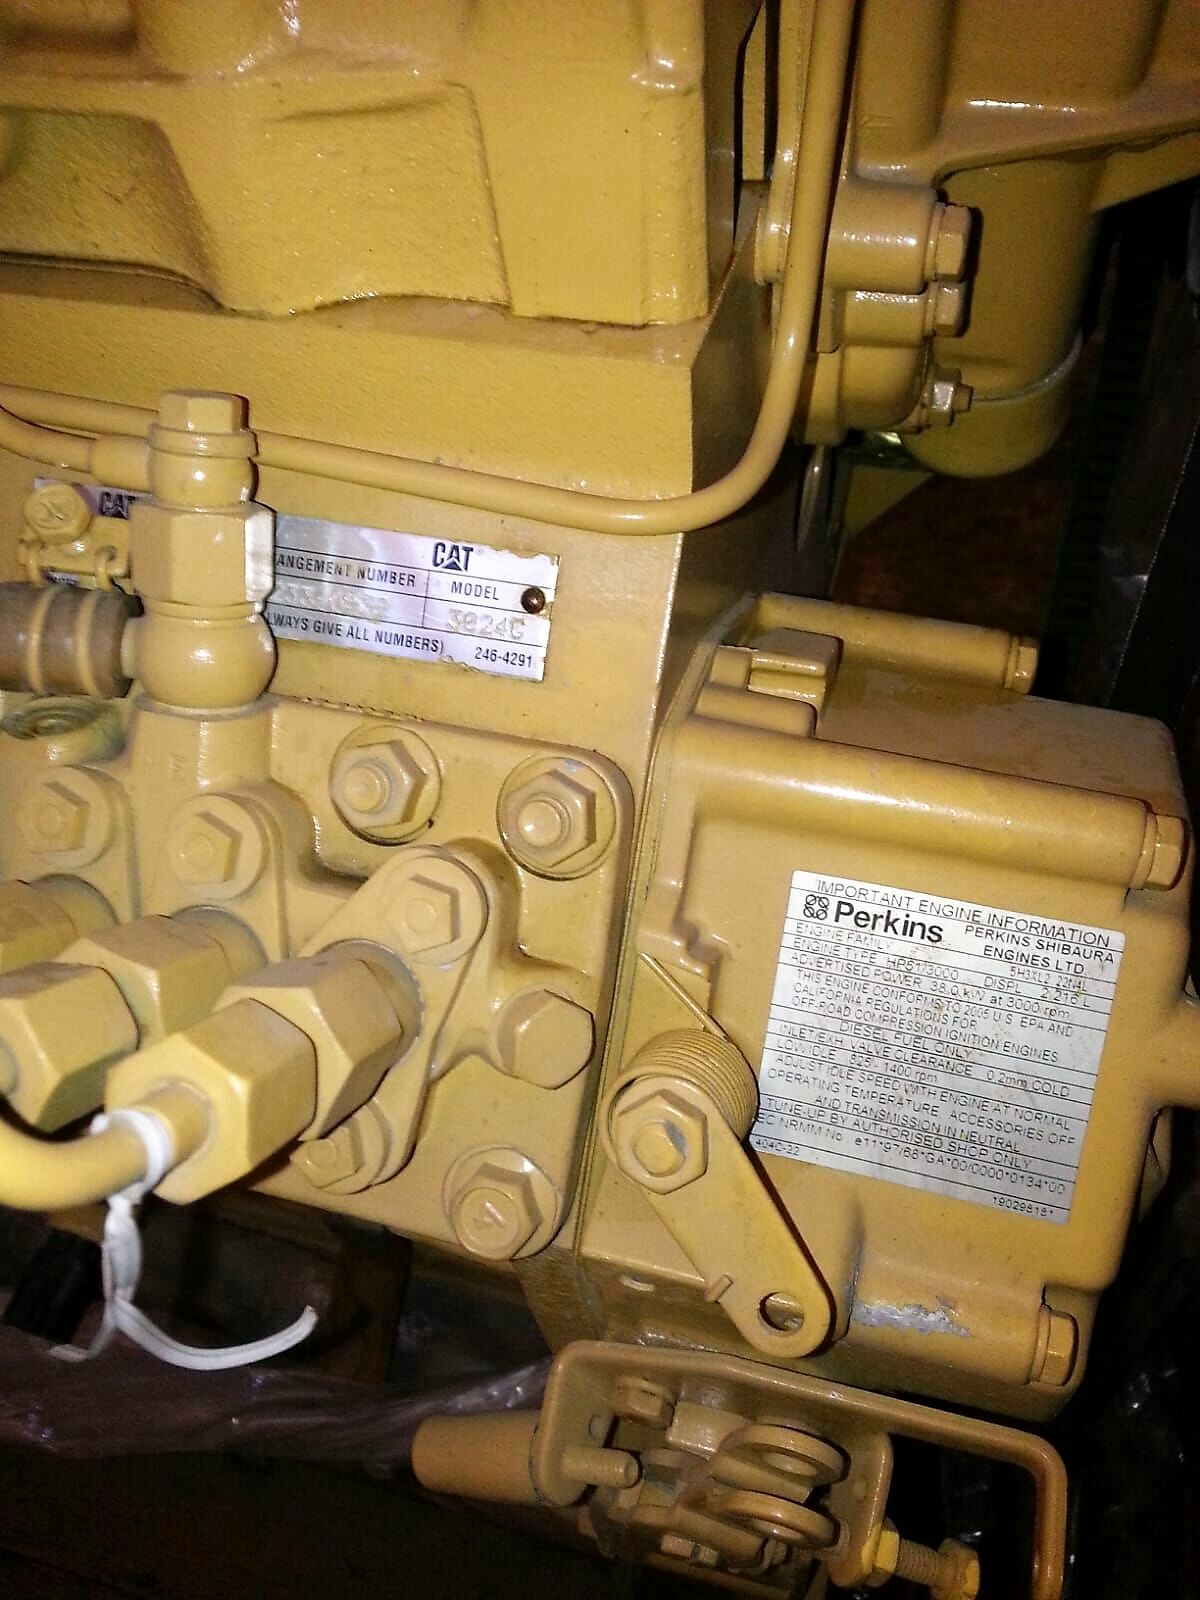 Stocklot Caterpillar engines - Stock Italy Srl